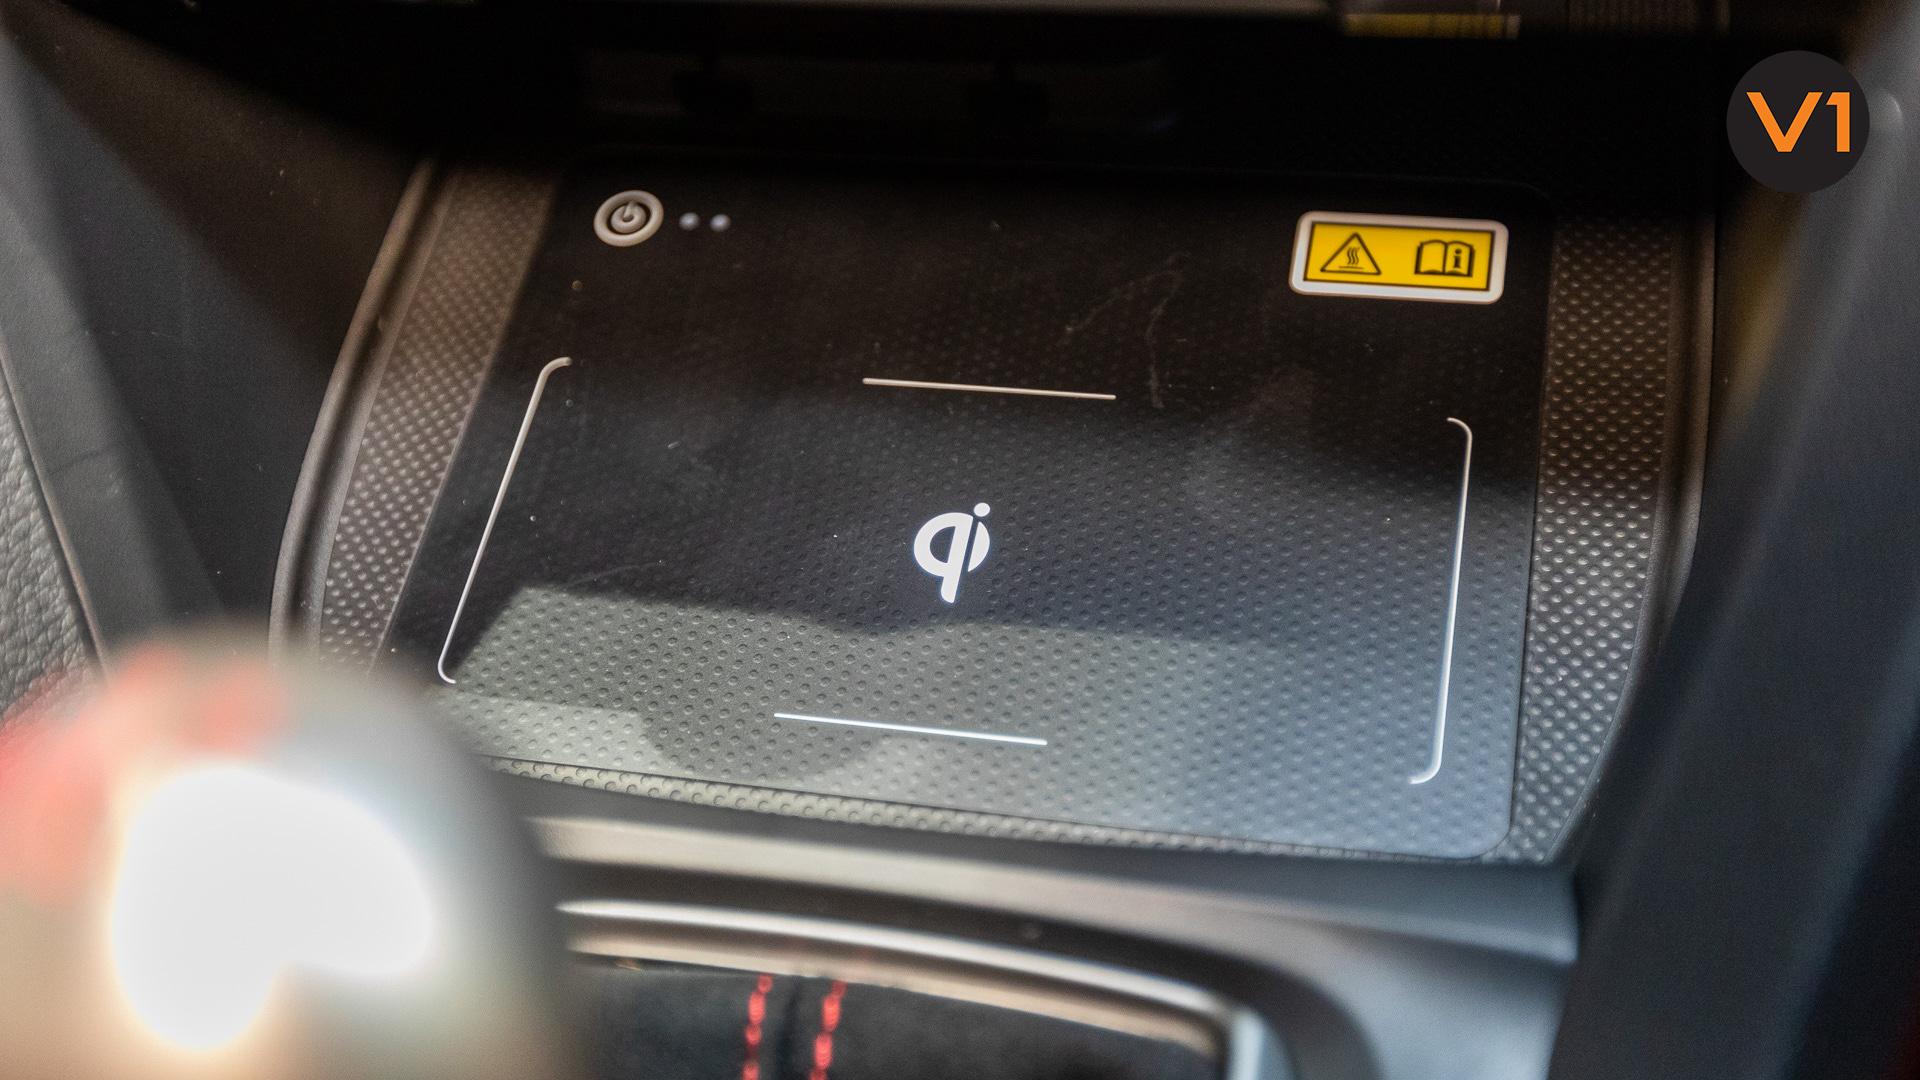 Honda Civic 2.0 Type R GT (FL2020) - Wireless Charging